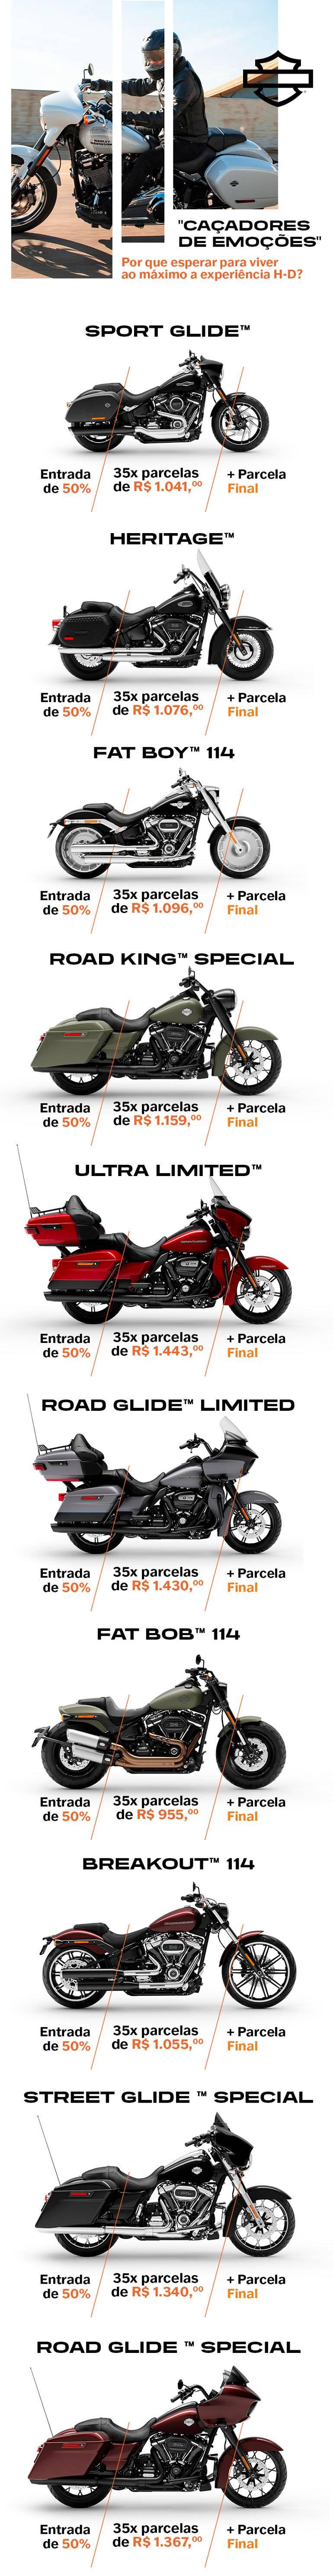 Oferta BH Harley-Davidson